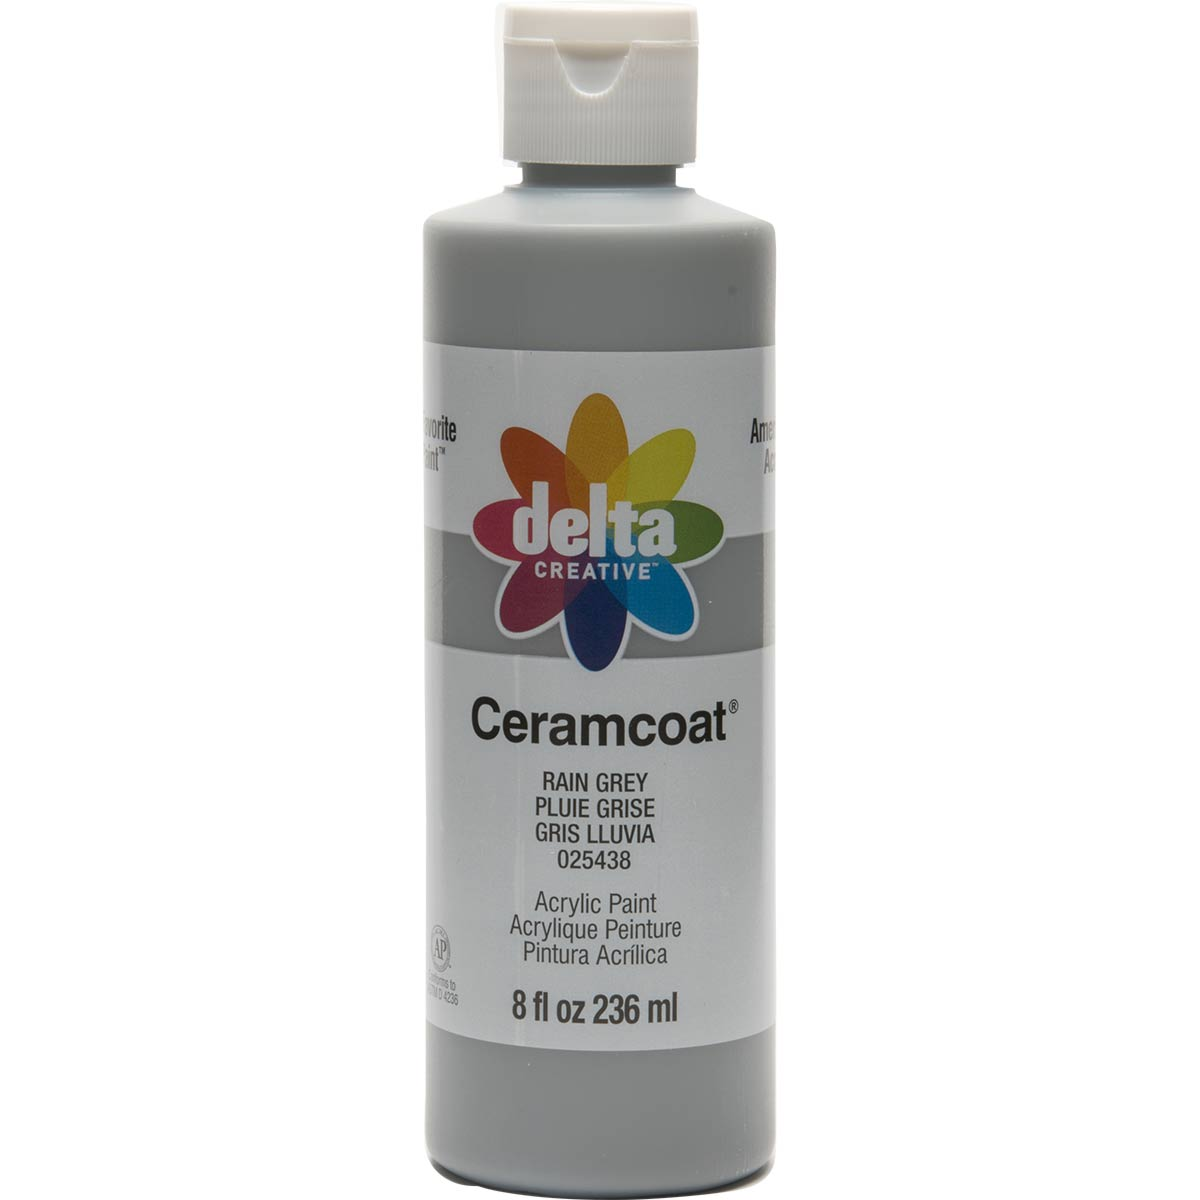 Delta Ceramcoat ® Acrylic Paint - Rain Grey, 8 oz.